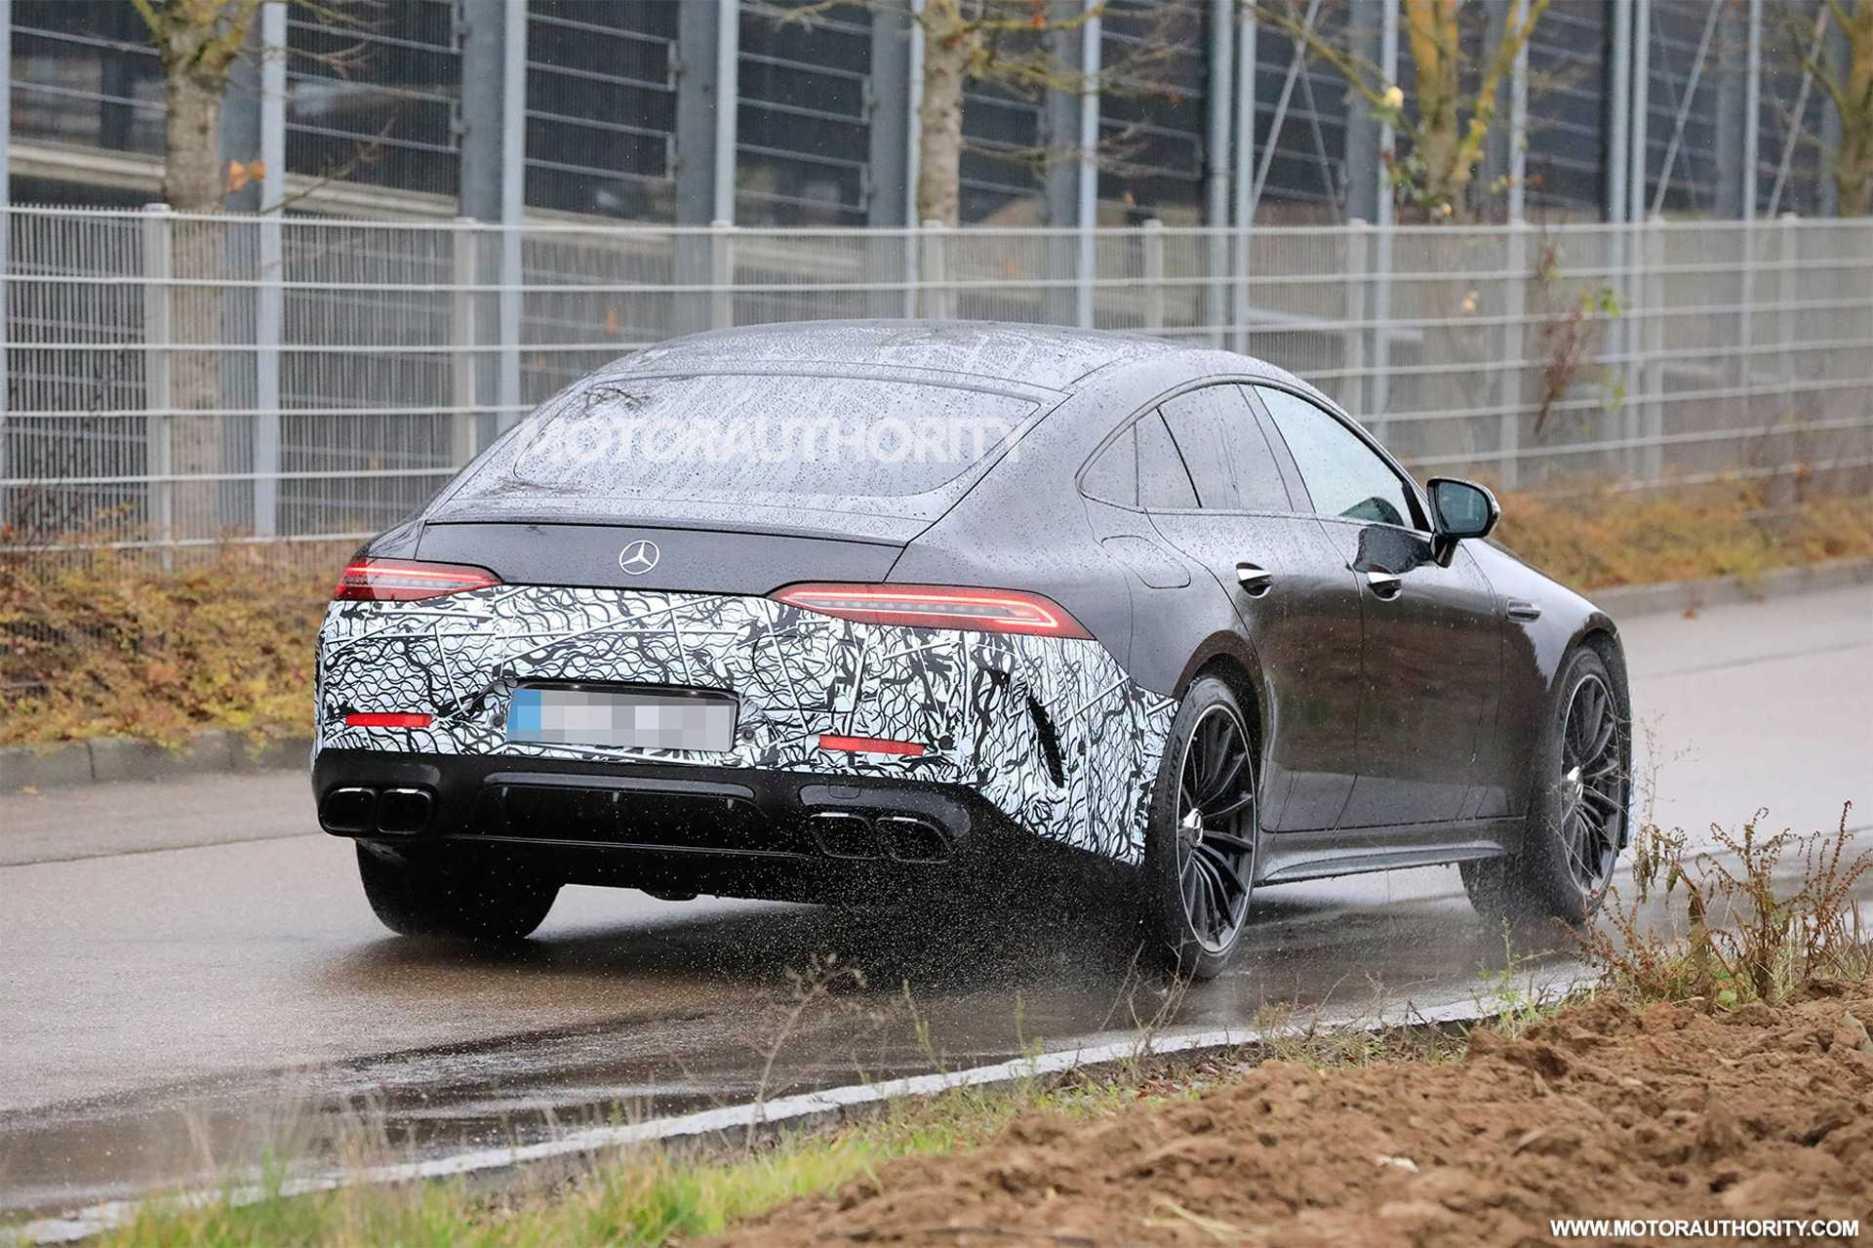 Mercedes Benz AMG spy shots